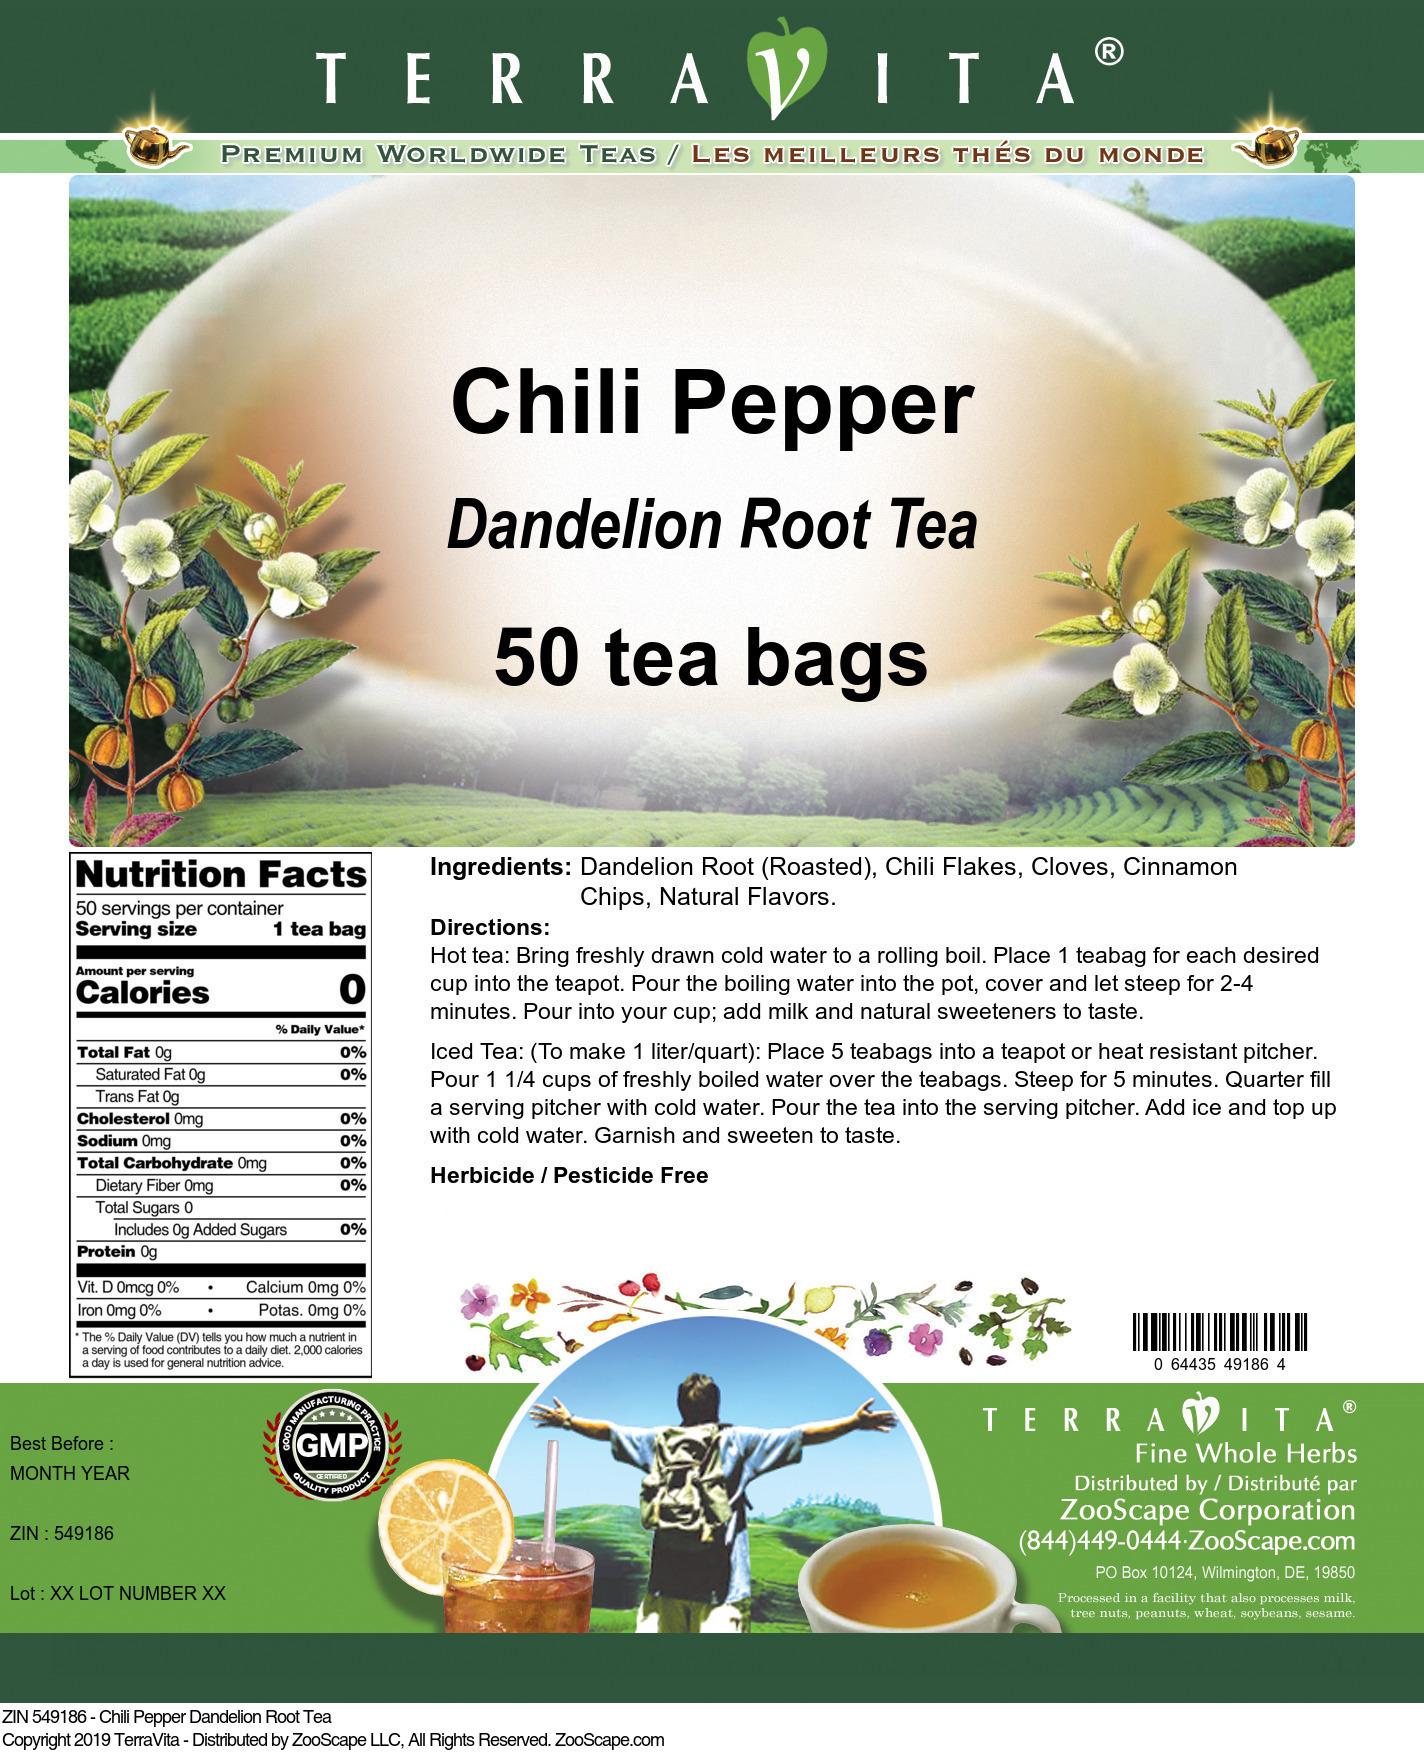 Chili Pepper Dandelion Root Tea